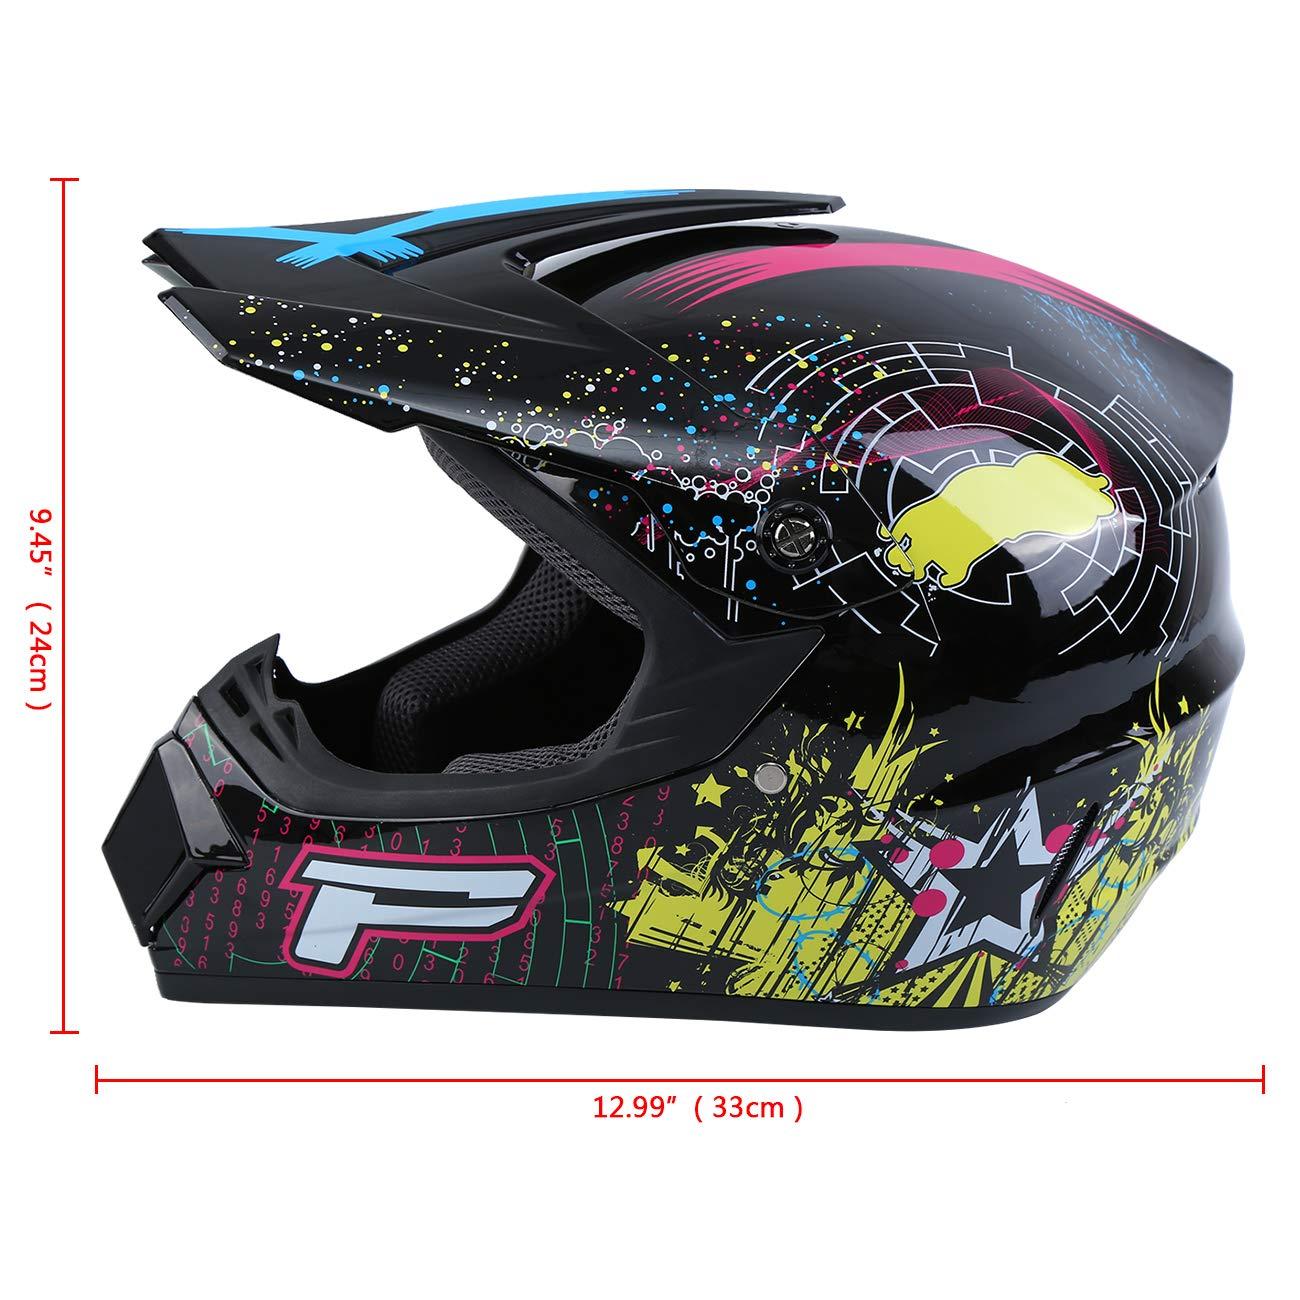 Jaune, M Samger Dot Adulte Casque Hors Route Casque Motocross Dirt Bike ATV Casque Moto Gants Lunettes